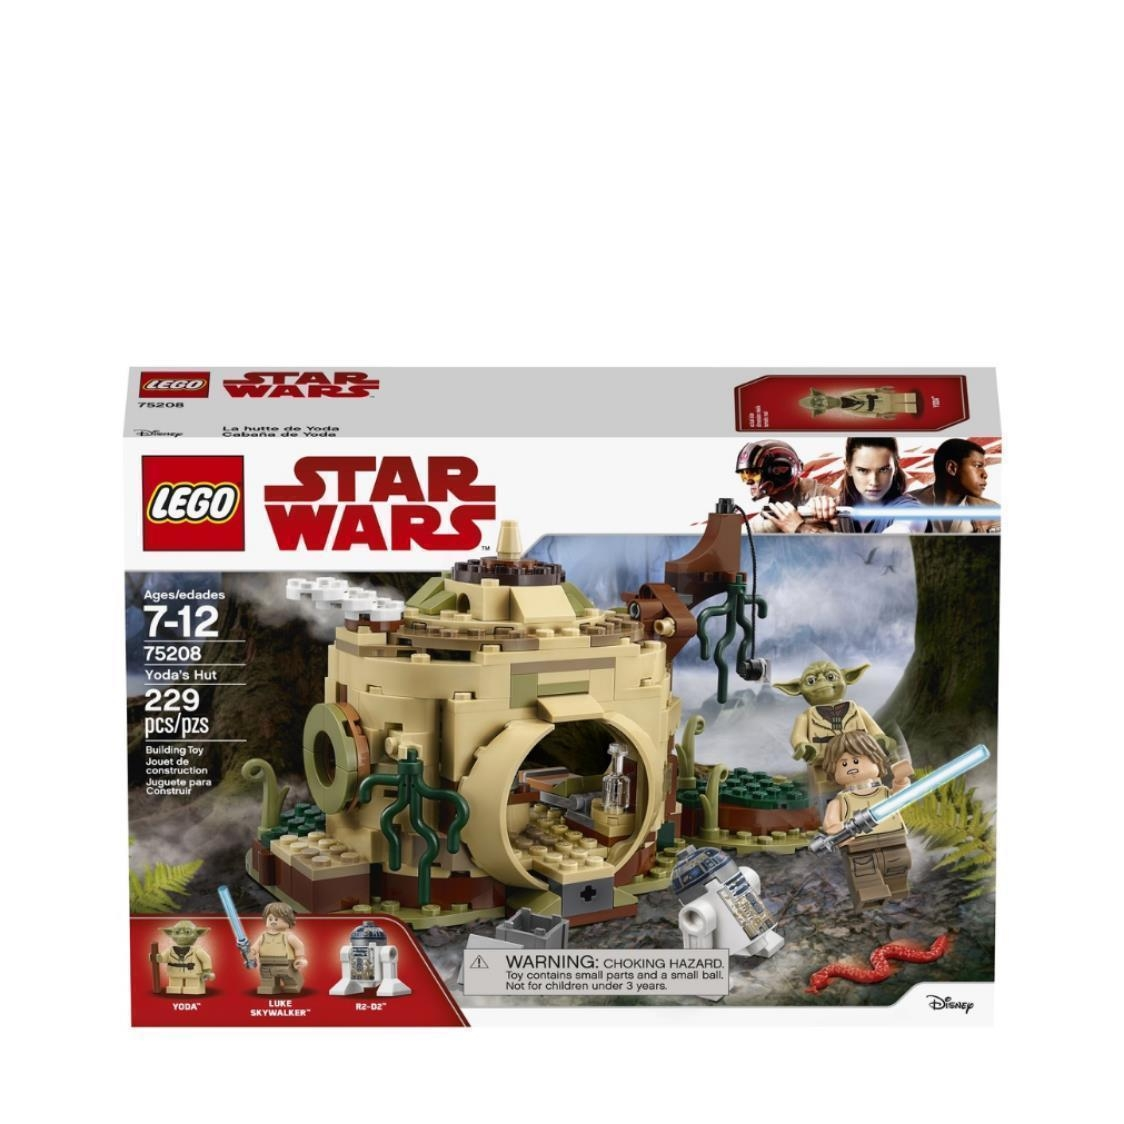 LEGO Star Wars - Yodas Hut 75208 V29